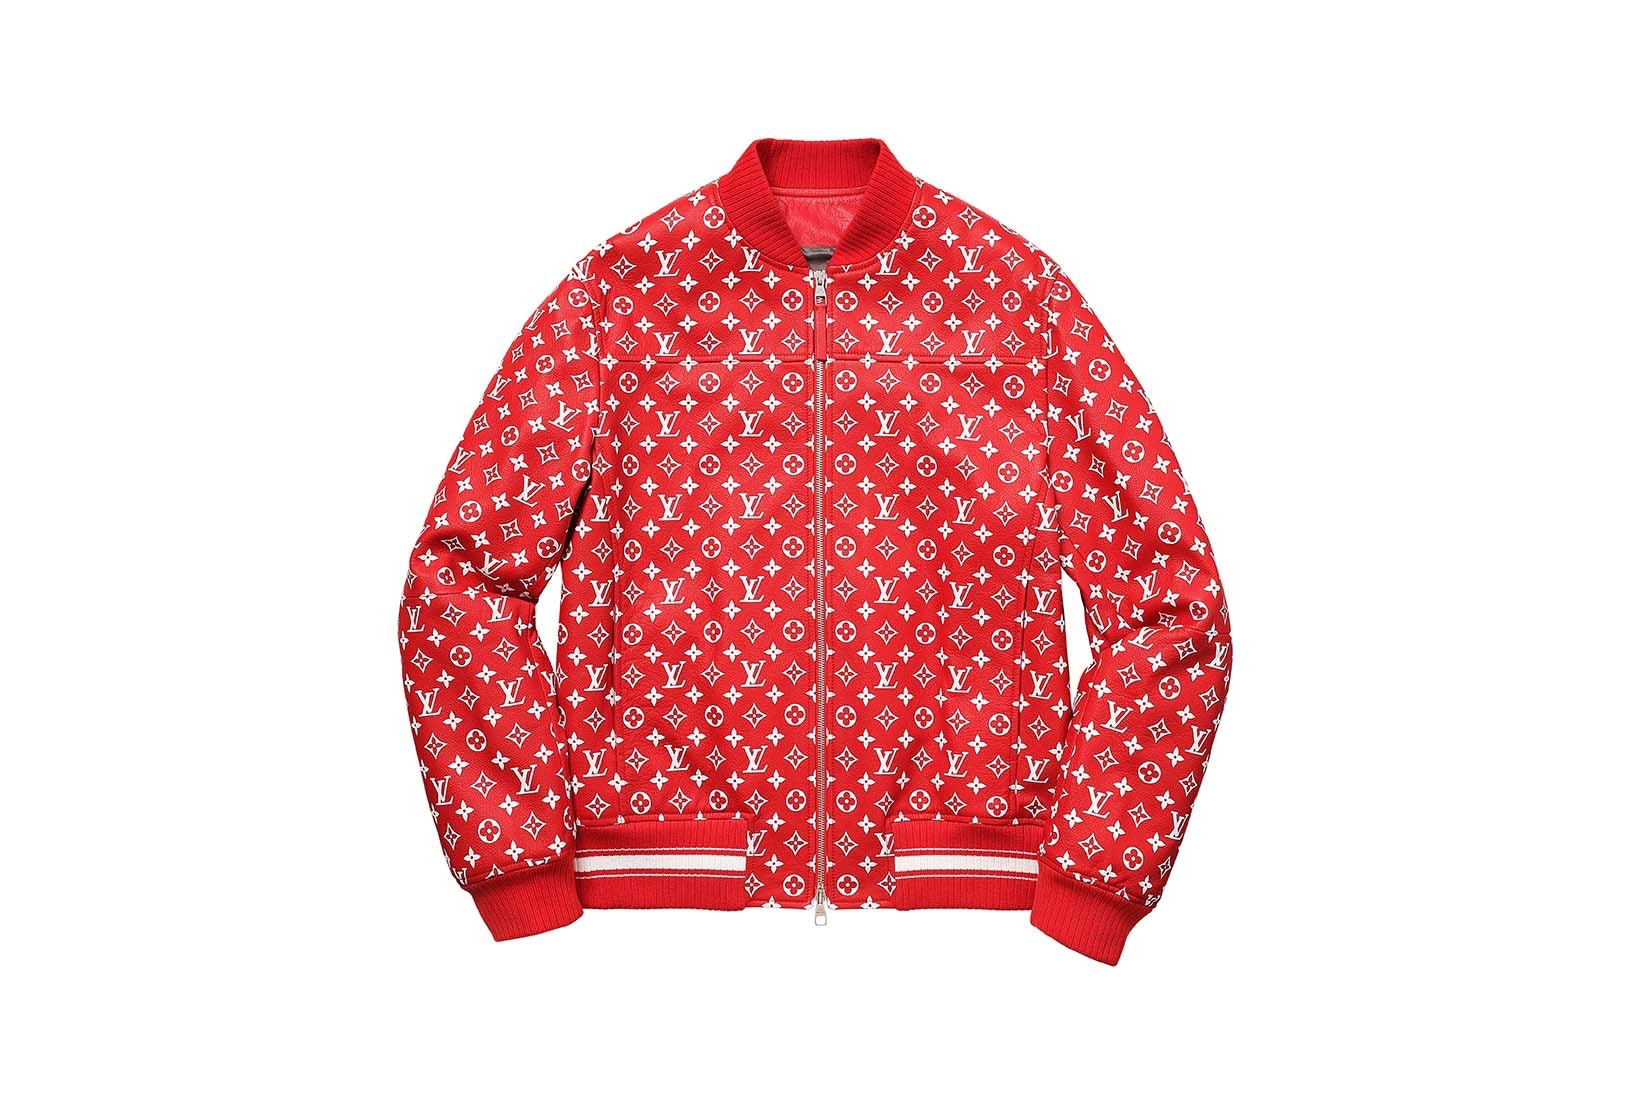 Supreme(シュプリーム)×Louis Vuitton(ルイ・ヴィトン) / レザー ベースボール ジャケット(Leather Baseball Jacket)